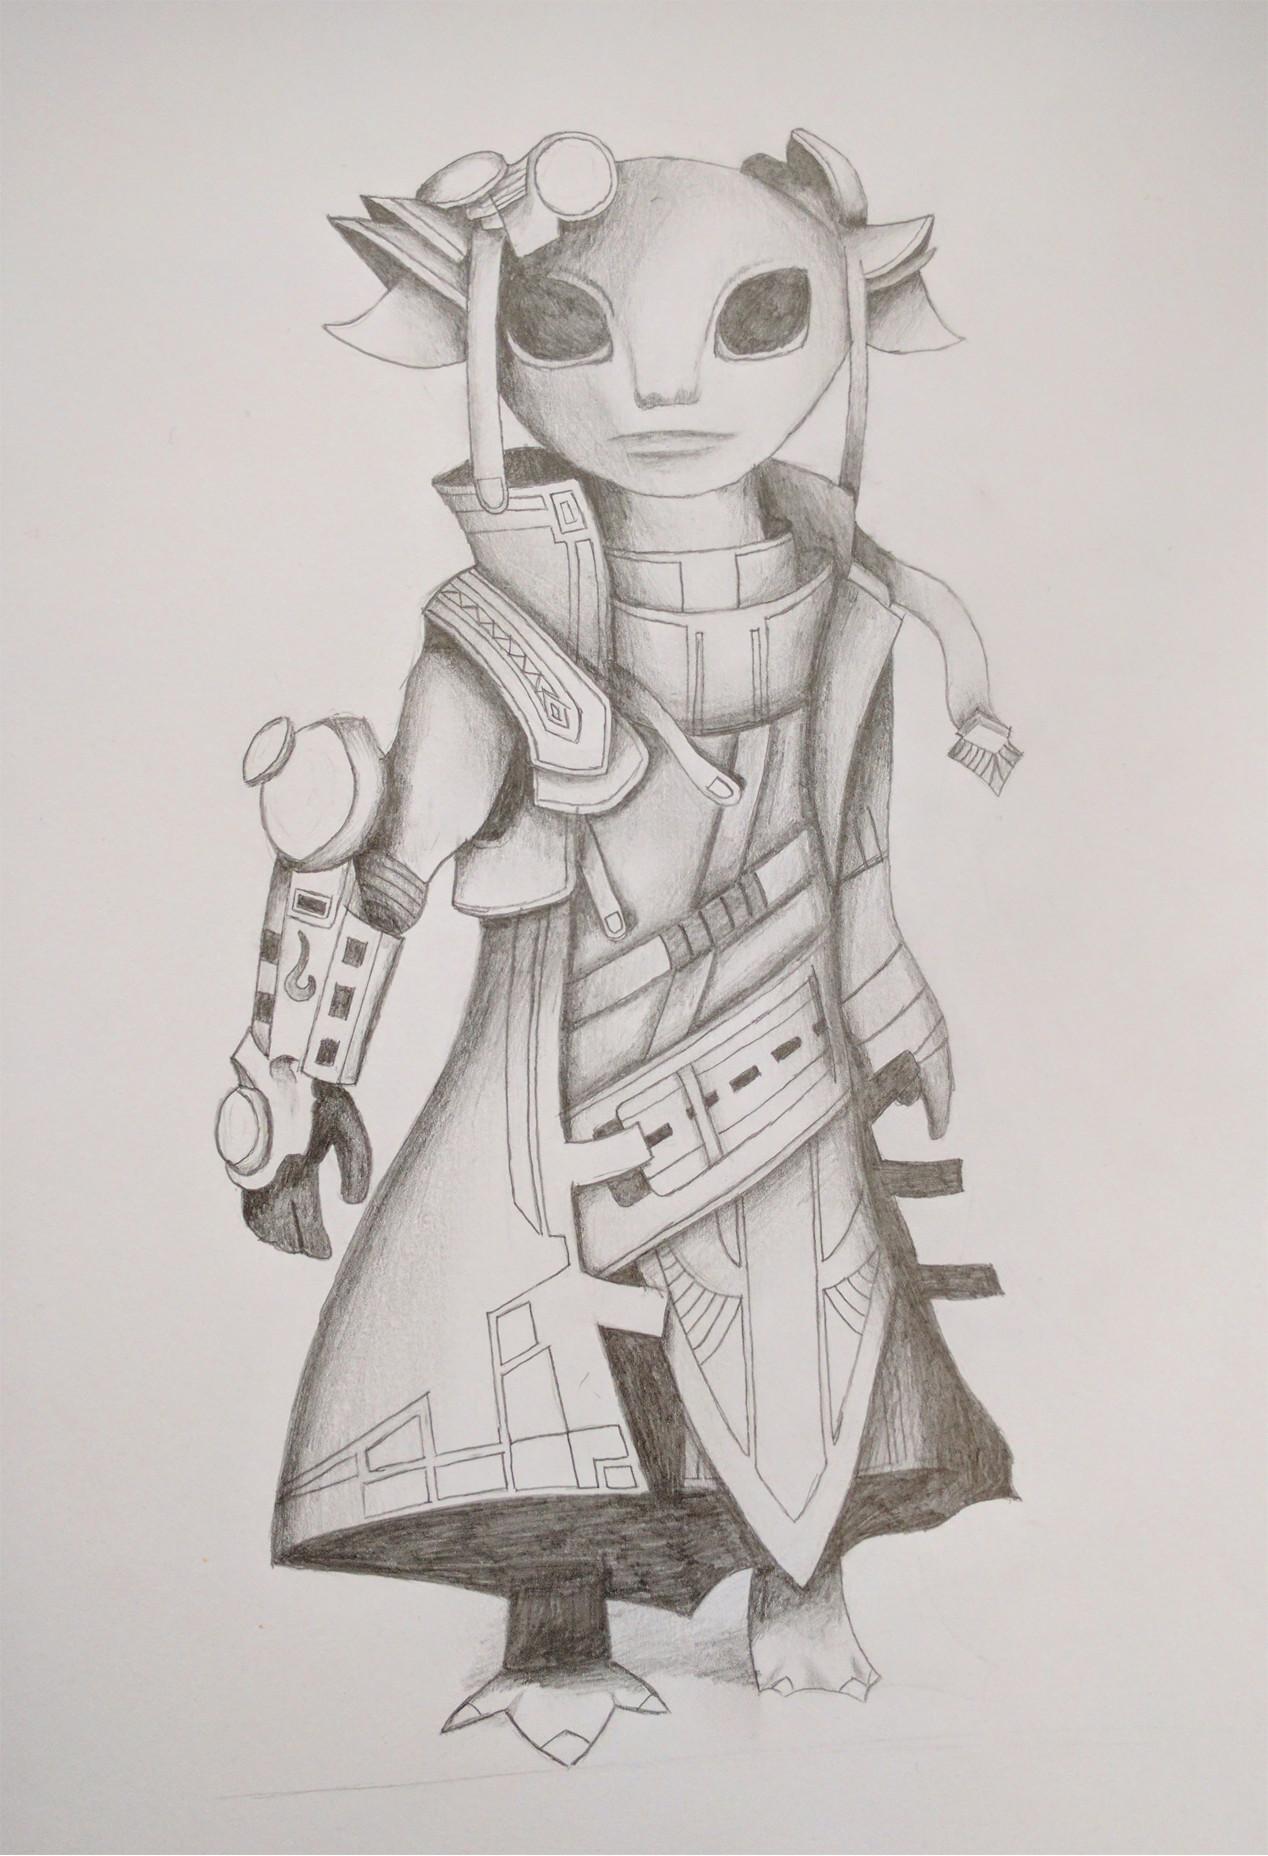 ArtStation - Drawing fantasy creatures, Vincent Halman